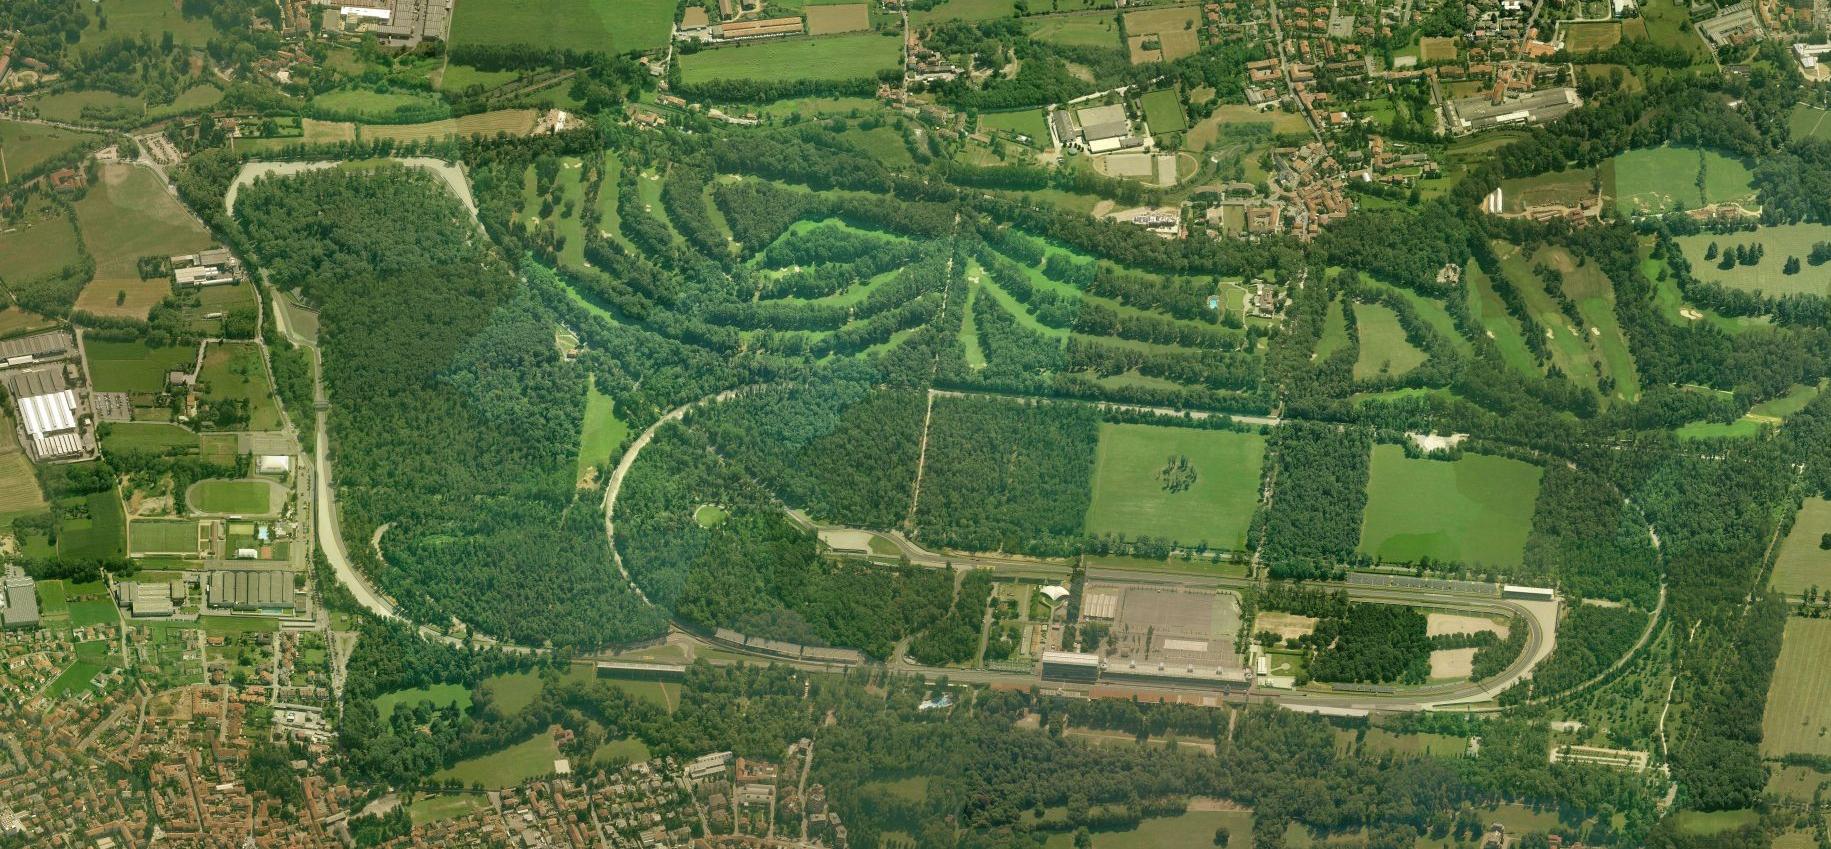 https://vignette.wikia.nocookie.net/gpgsuperleague/images/3/39/Monza_aerial.png/revision/latest?cb=20160507074356